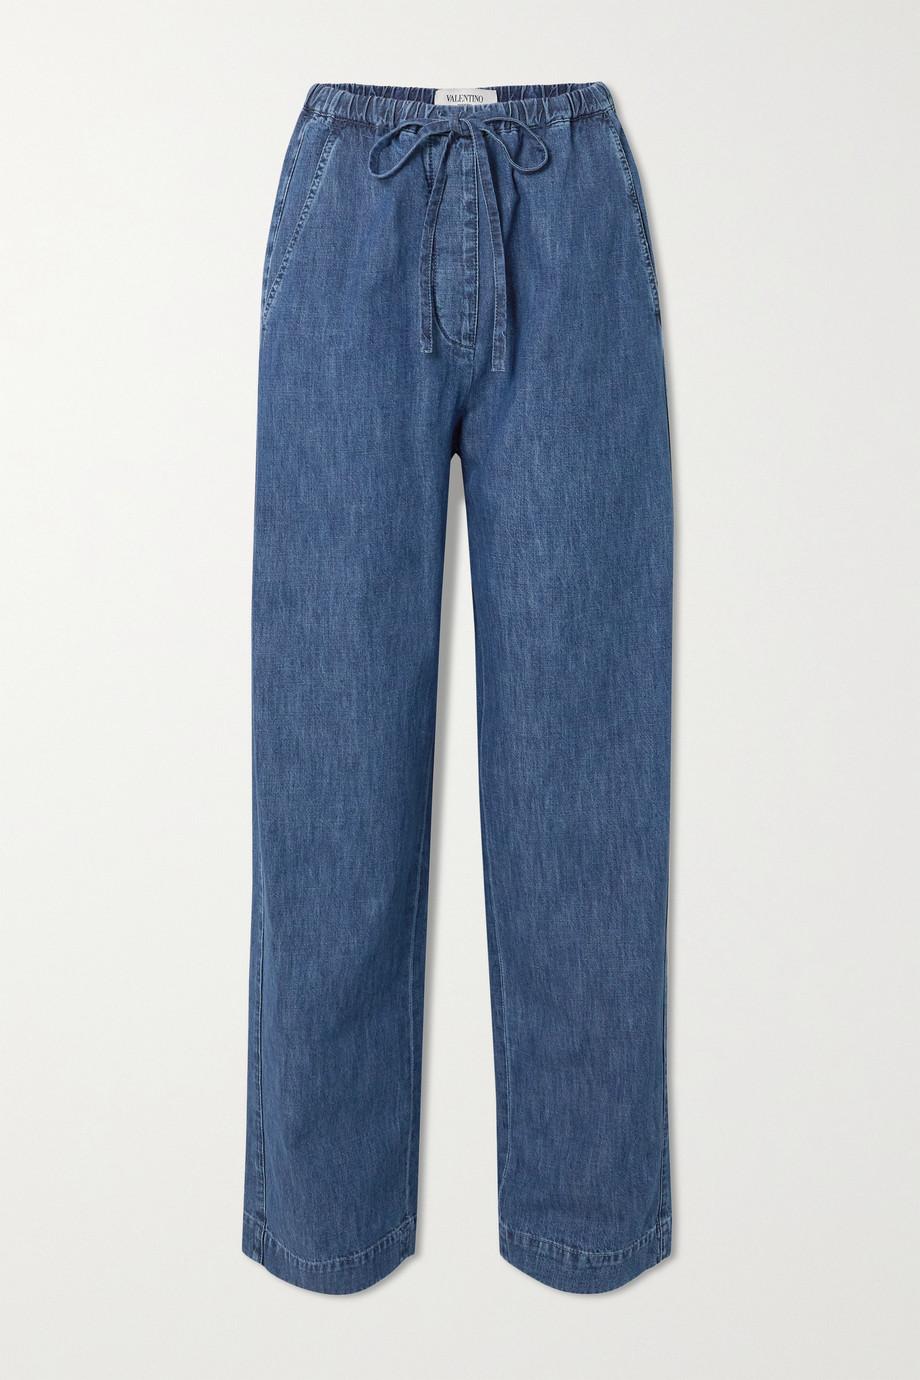 Valentino Wide-leg denim jeans